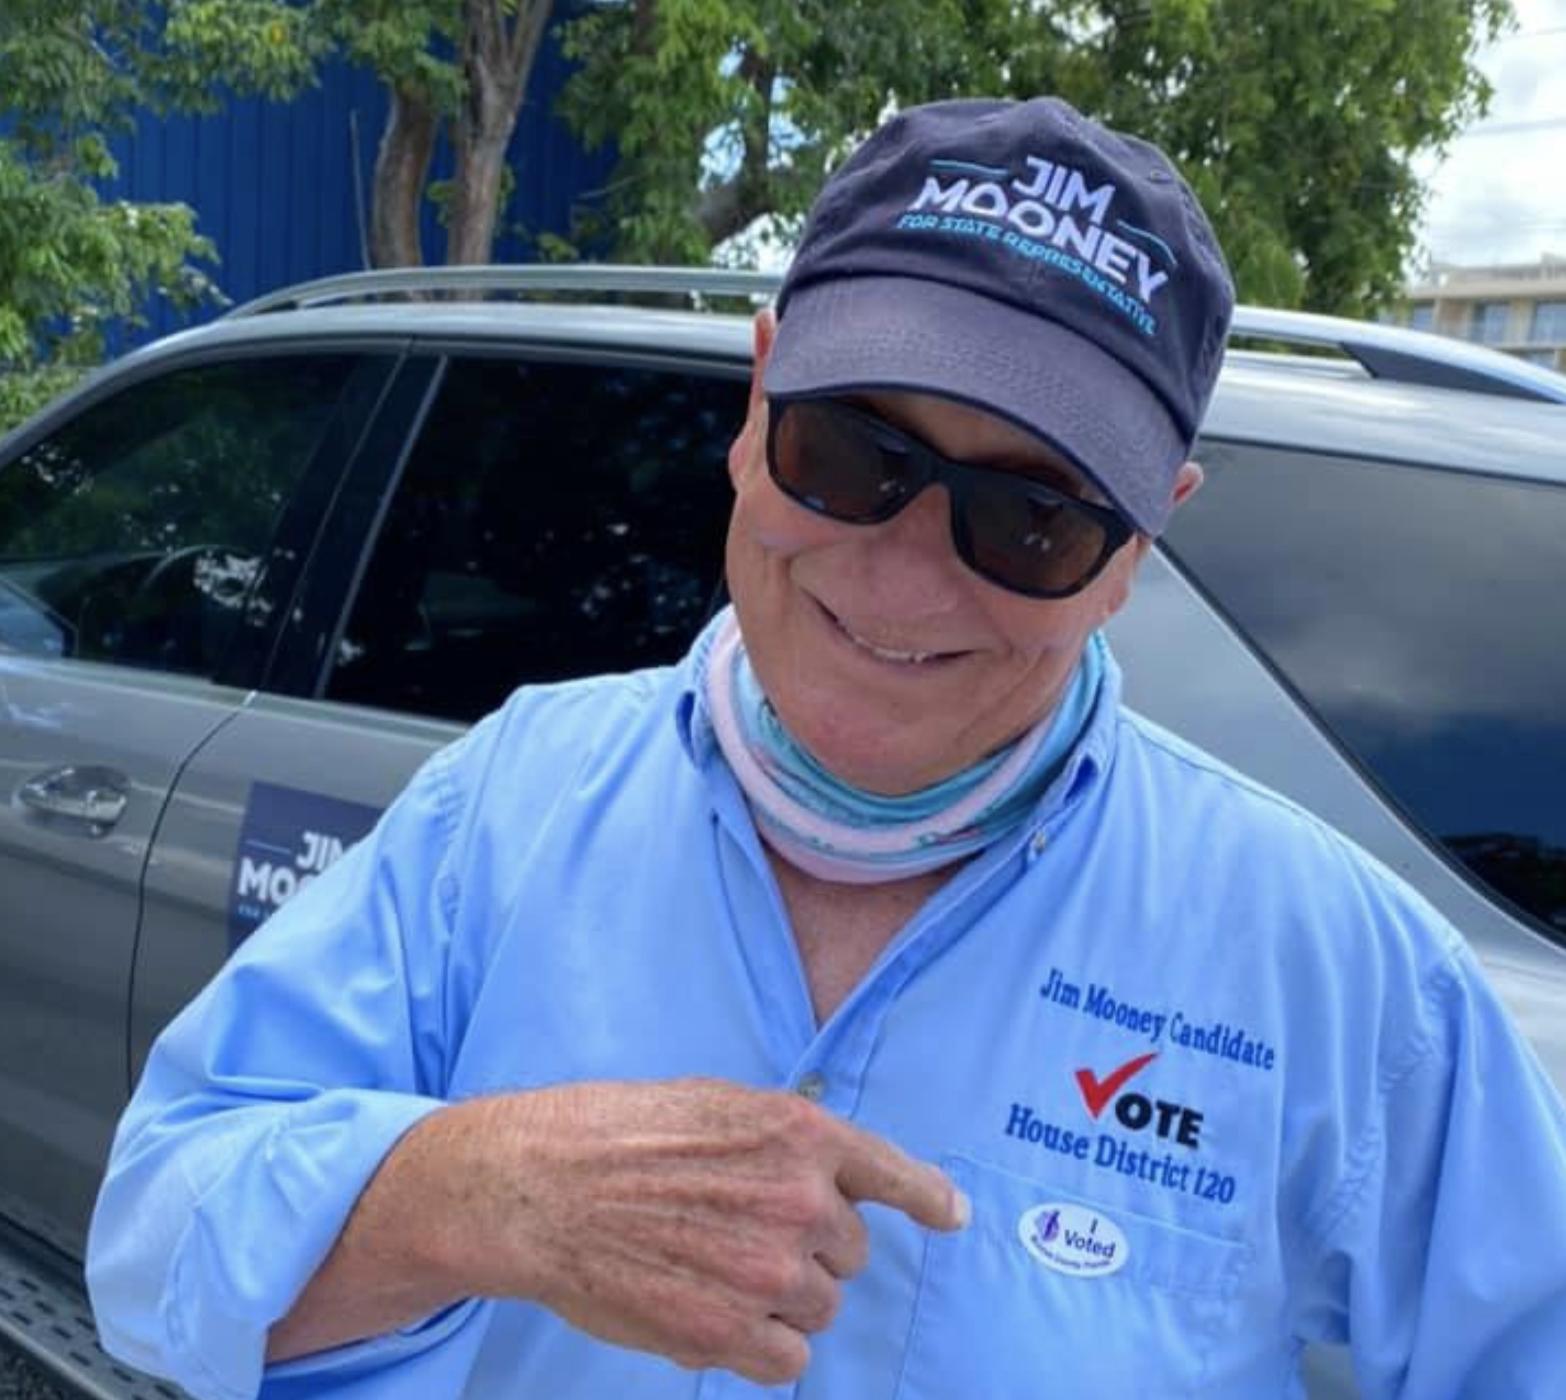 Mooney needs Miami-Dade to win Florida House Seat 120